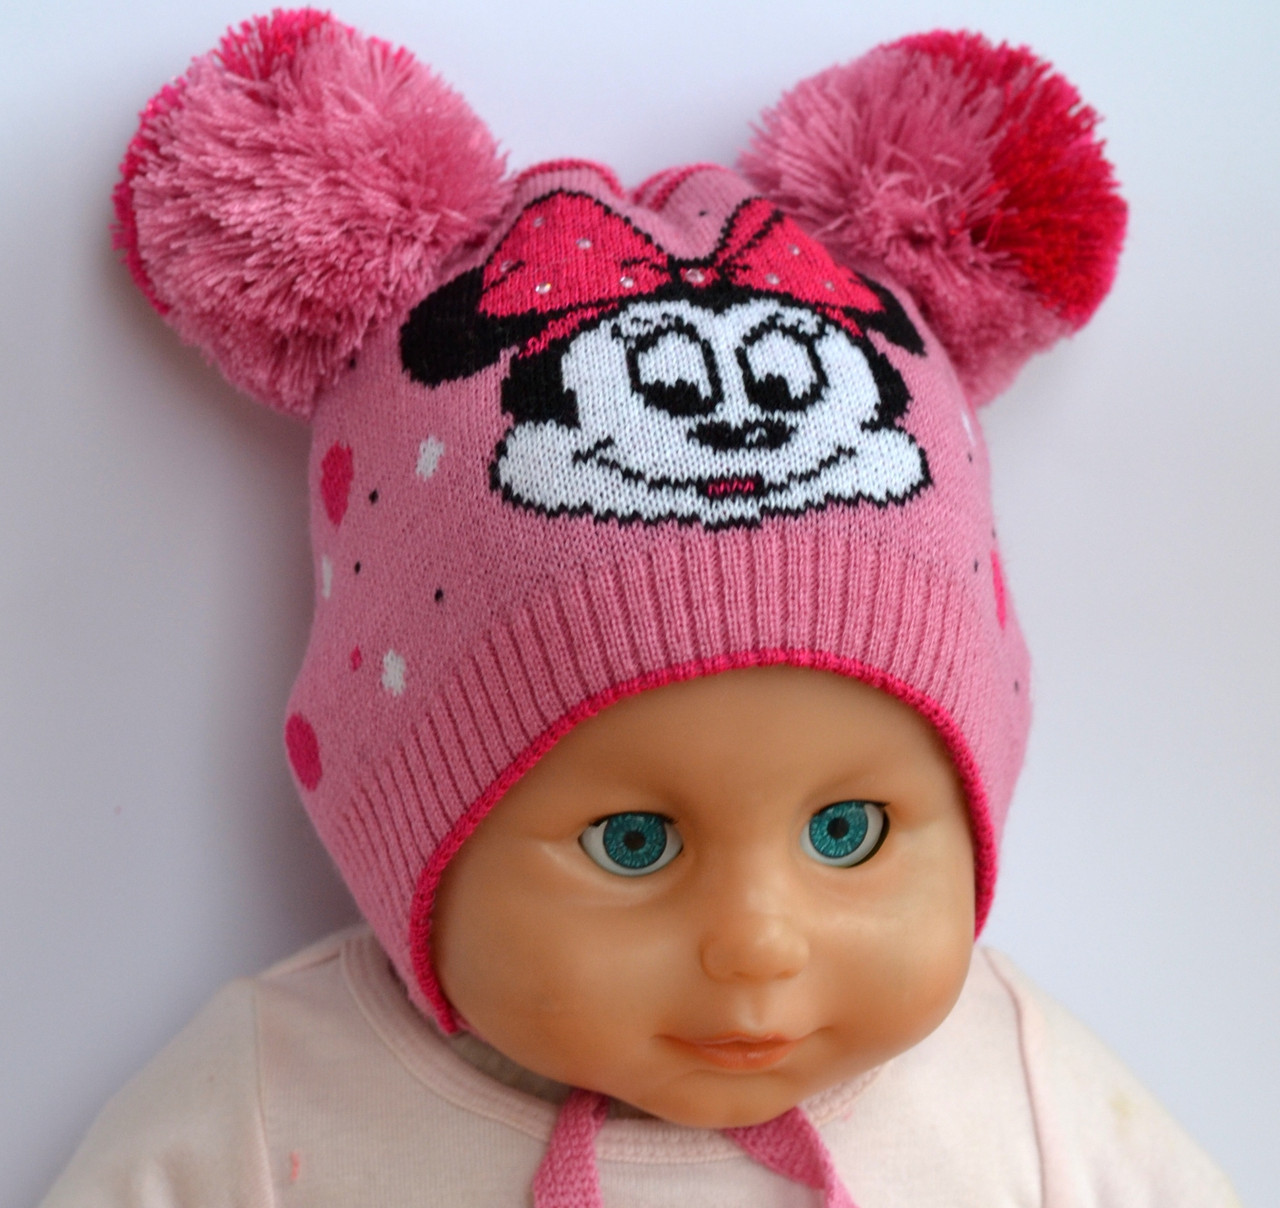 Шапка для девочки Микки Маус розовый Арктик 002 (р.40-44)